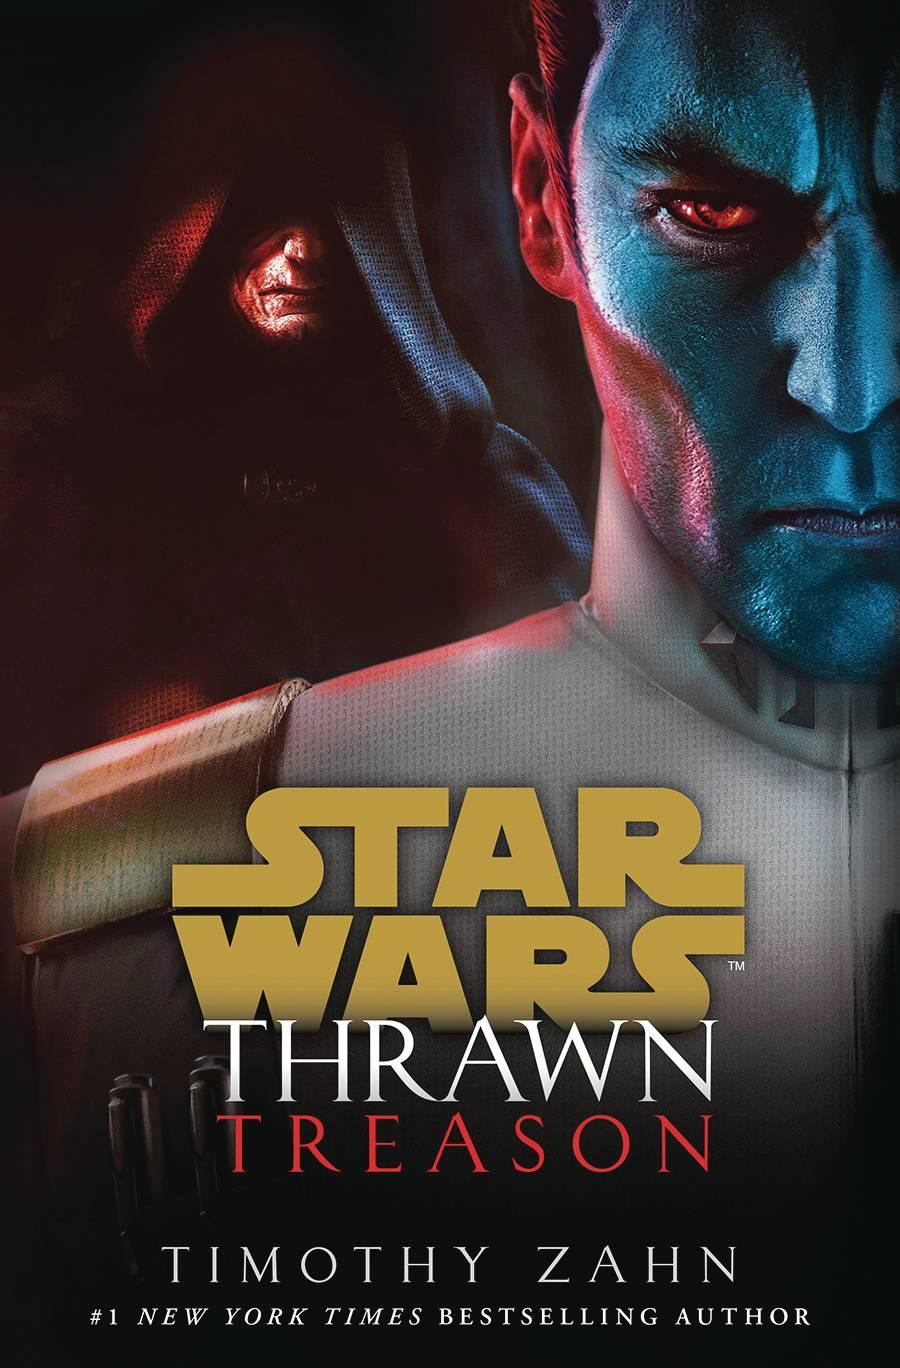 STAR WARS THRAWN TREASON PB